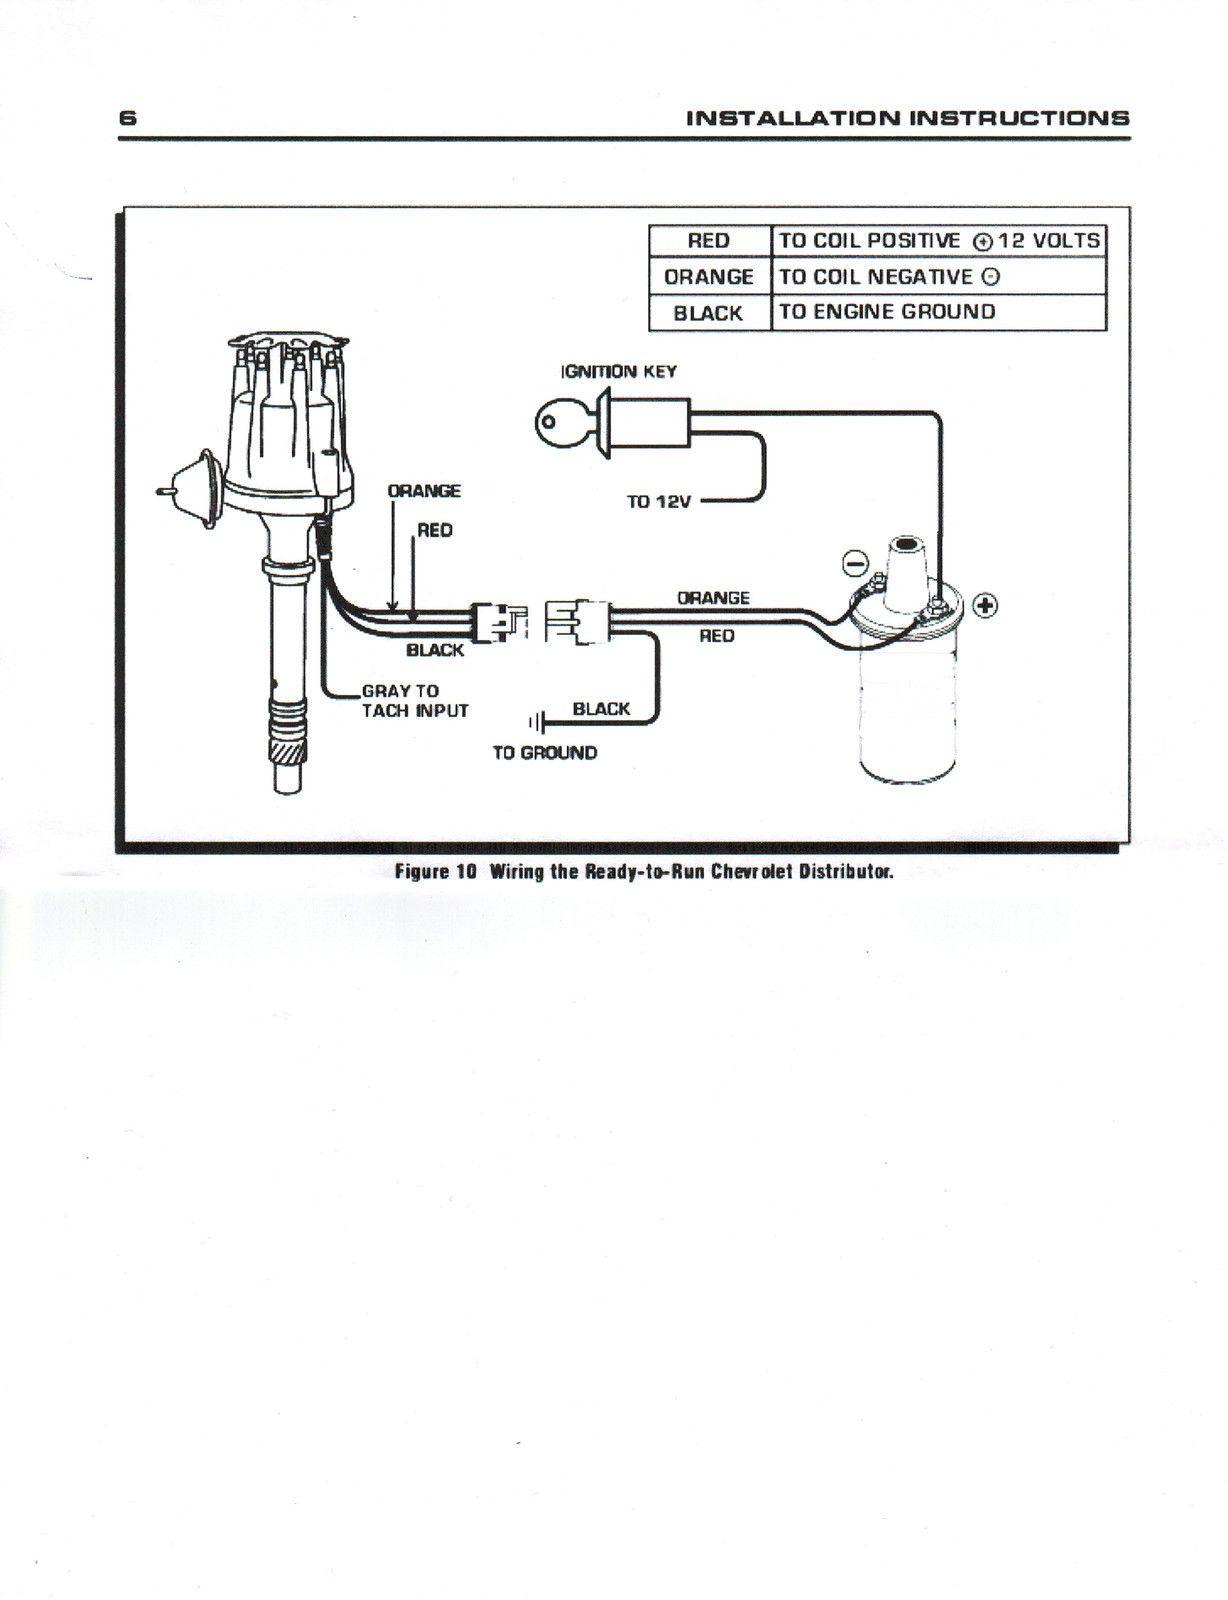 Chevy 350 Hei Distributor Wiring Diagram - Wiring Diagram in 2021 |  Diagram, Chevy, Trailer wiring diagram | Chevy 350 Tachometer Wiring |  | Pinterest